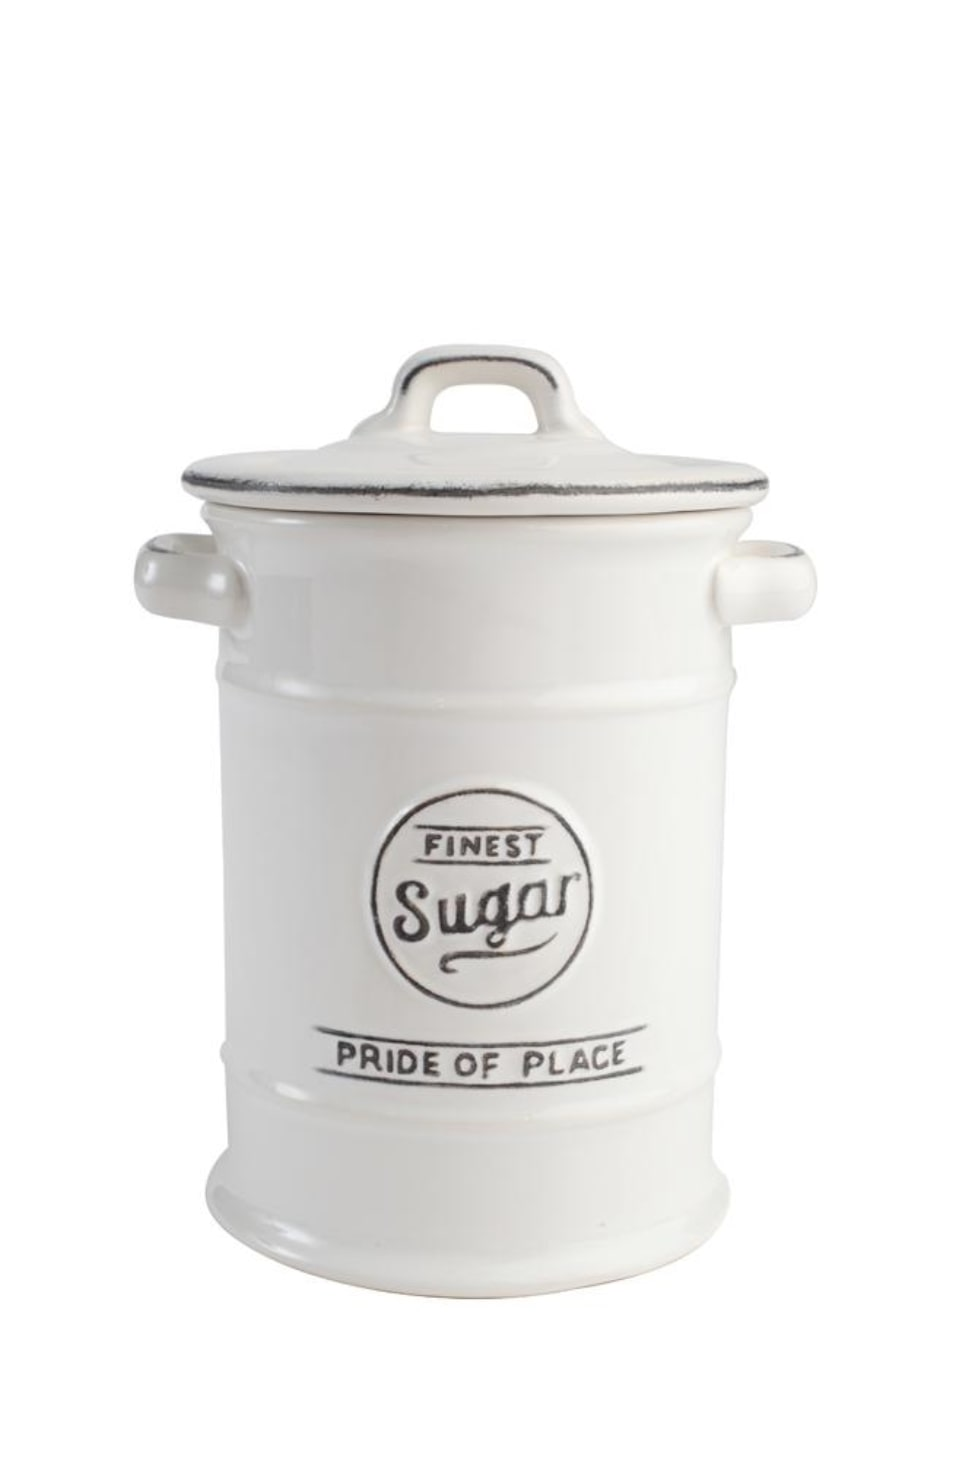 Онлайн каталог PROMENU: Емкость для сахара с крышкой T&G Pride Of Place, 18 см                               18076